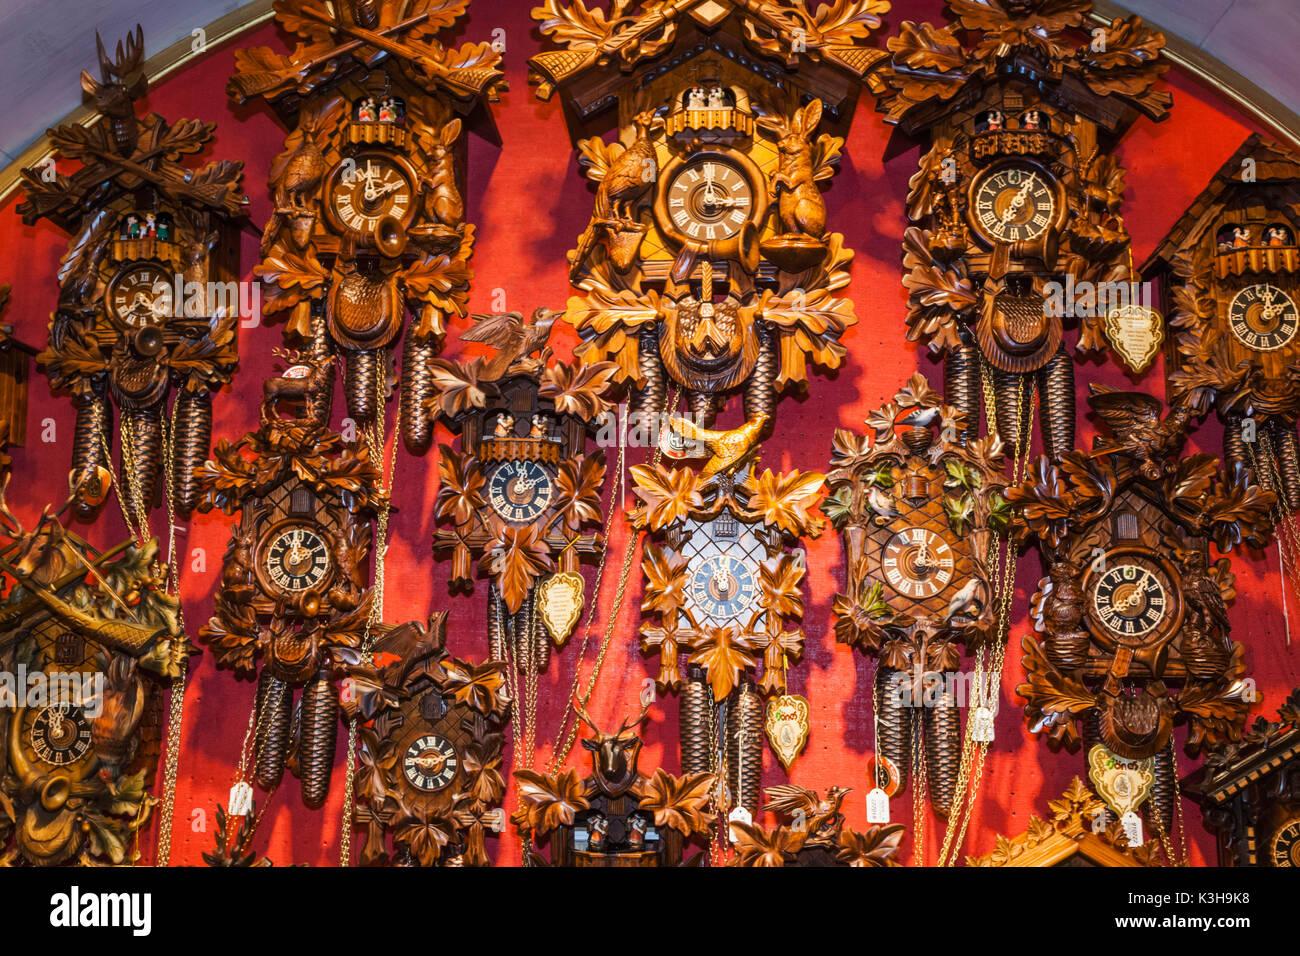 Germany, Bavaria, Romantic Road, Rothenburg-ob-der-Tauber, Kaethe Wohlfart Christmas Shop, Cuckoo Clocks - Stock Image